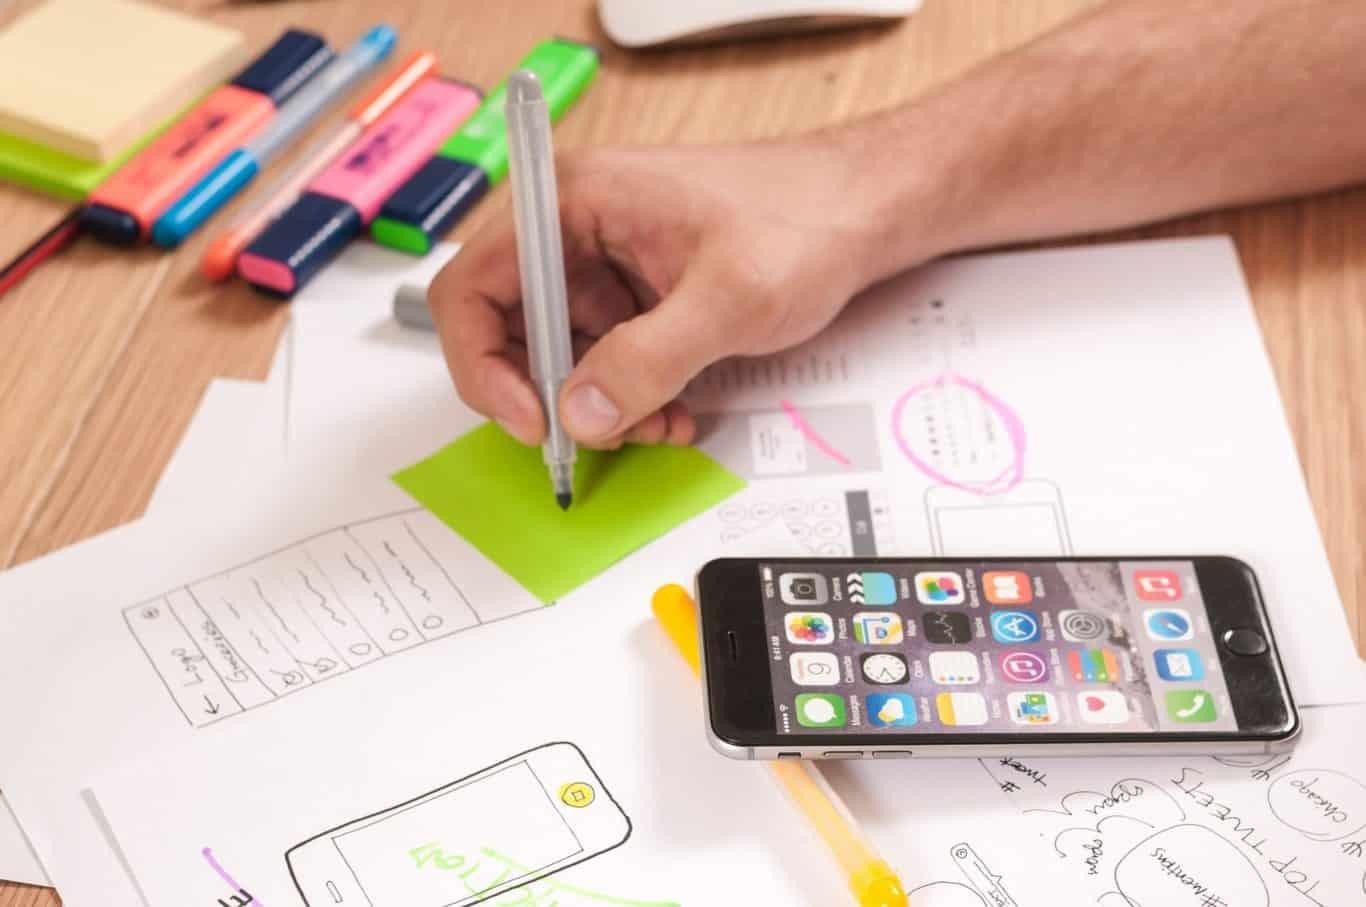 Framework Enterprise Mobile Strategy Enterprise mobile solutions